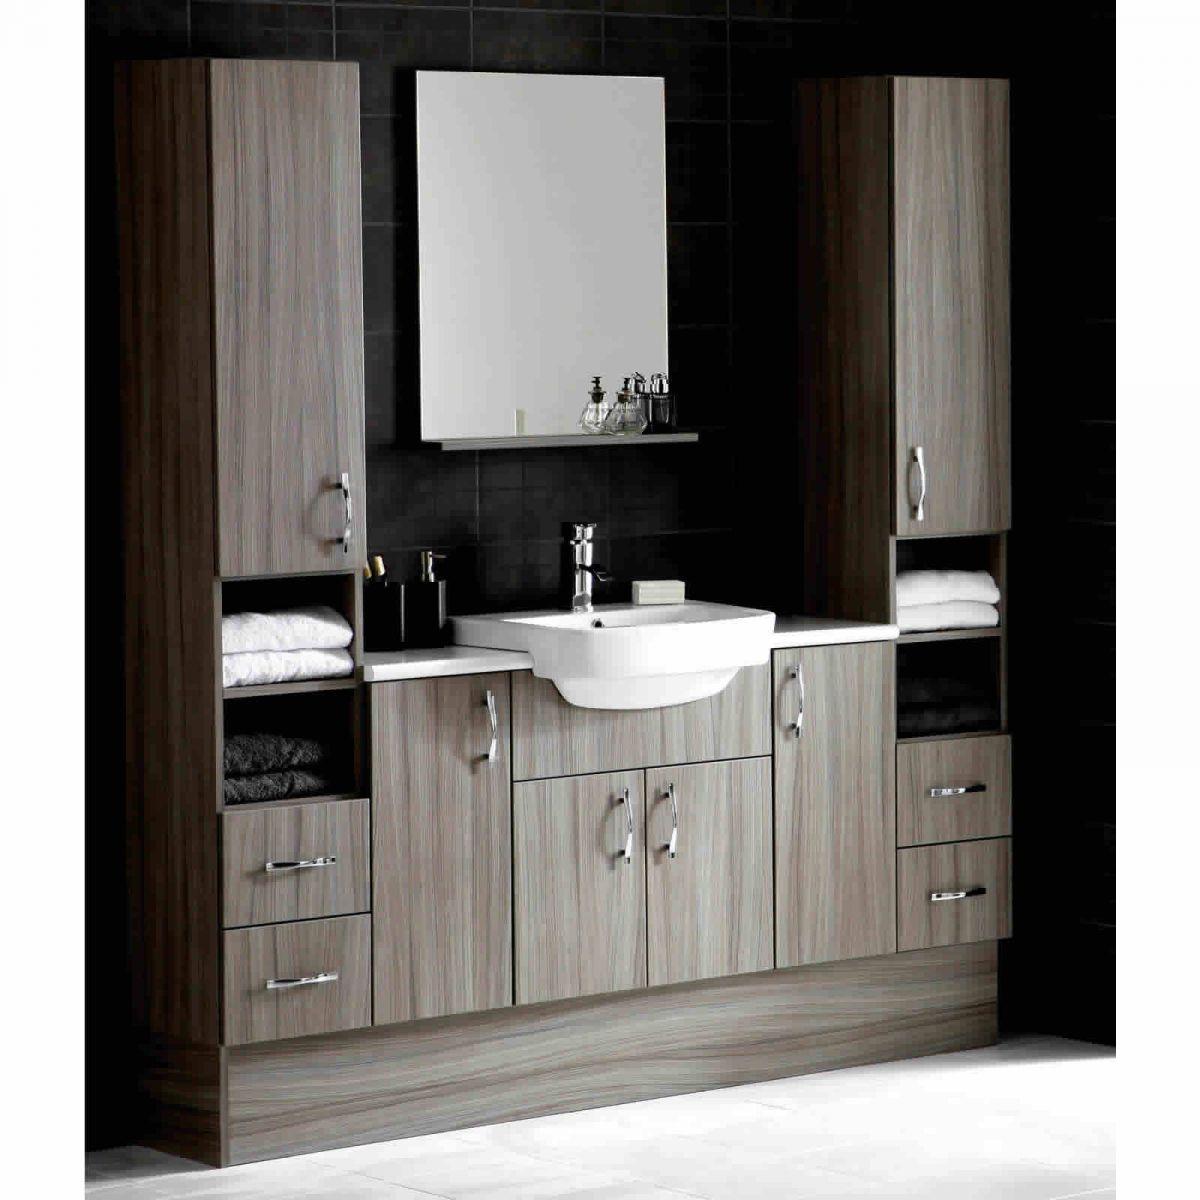 Bathroom units uk - Noble Dueto 2 Drawer Tall Bathroom Unit